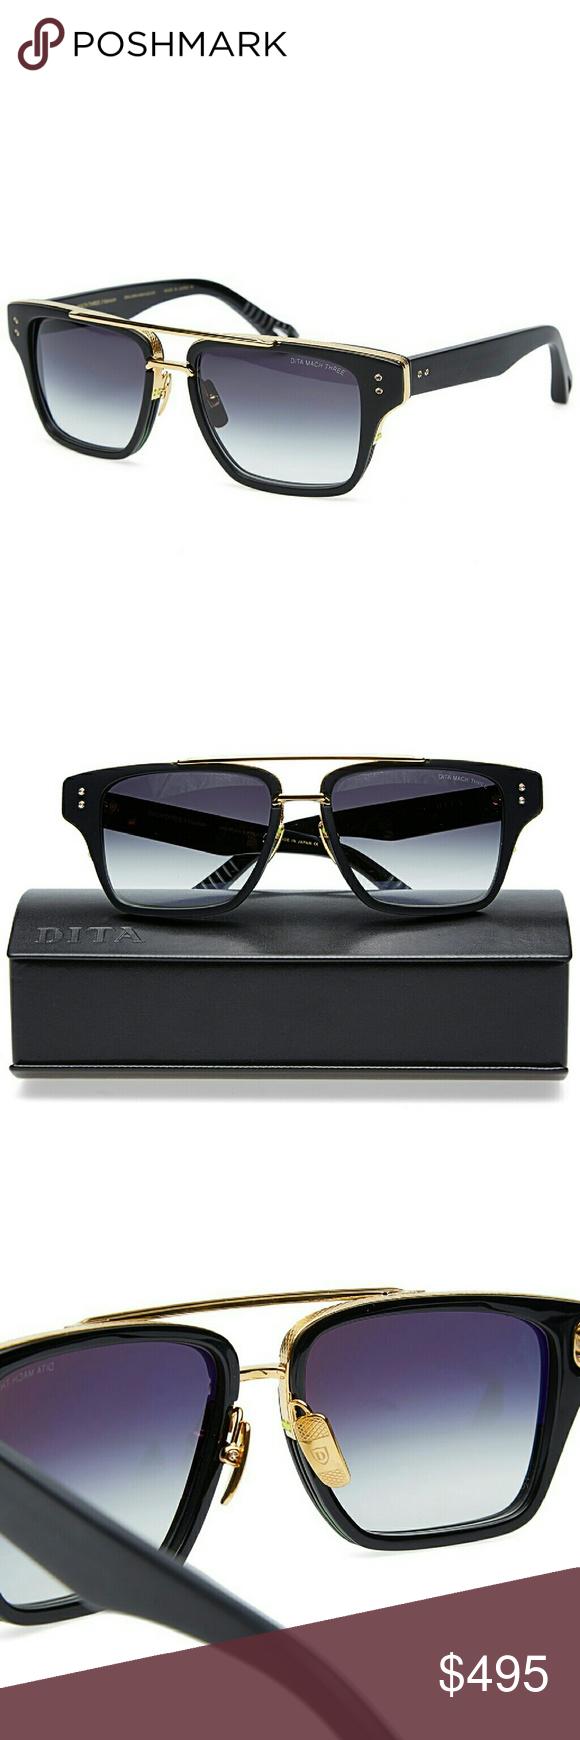 13c66a23f49 Dita Mach Three Unisex Sunglasses Model   DRX-2059-A-BLK-GLD-55 Gold ...